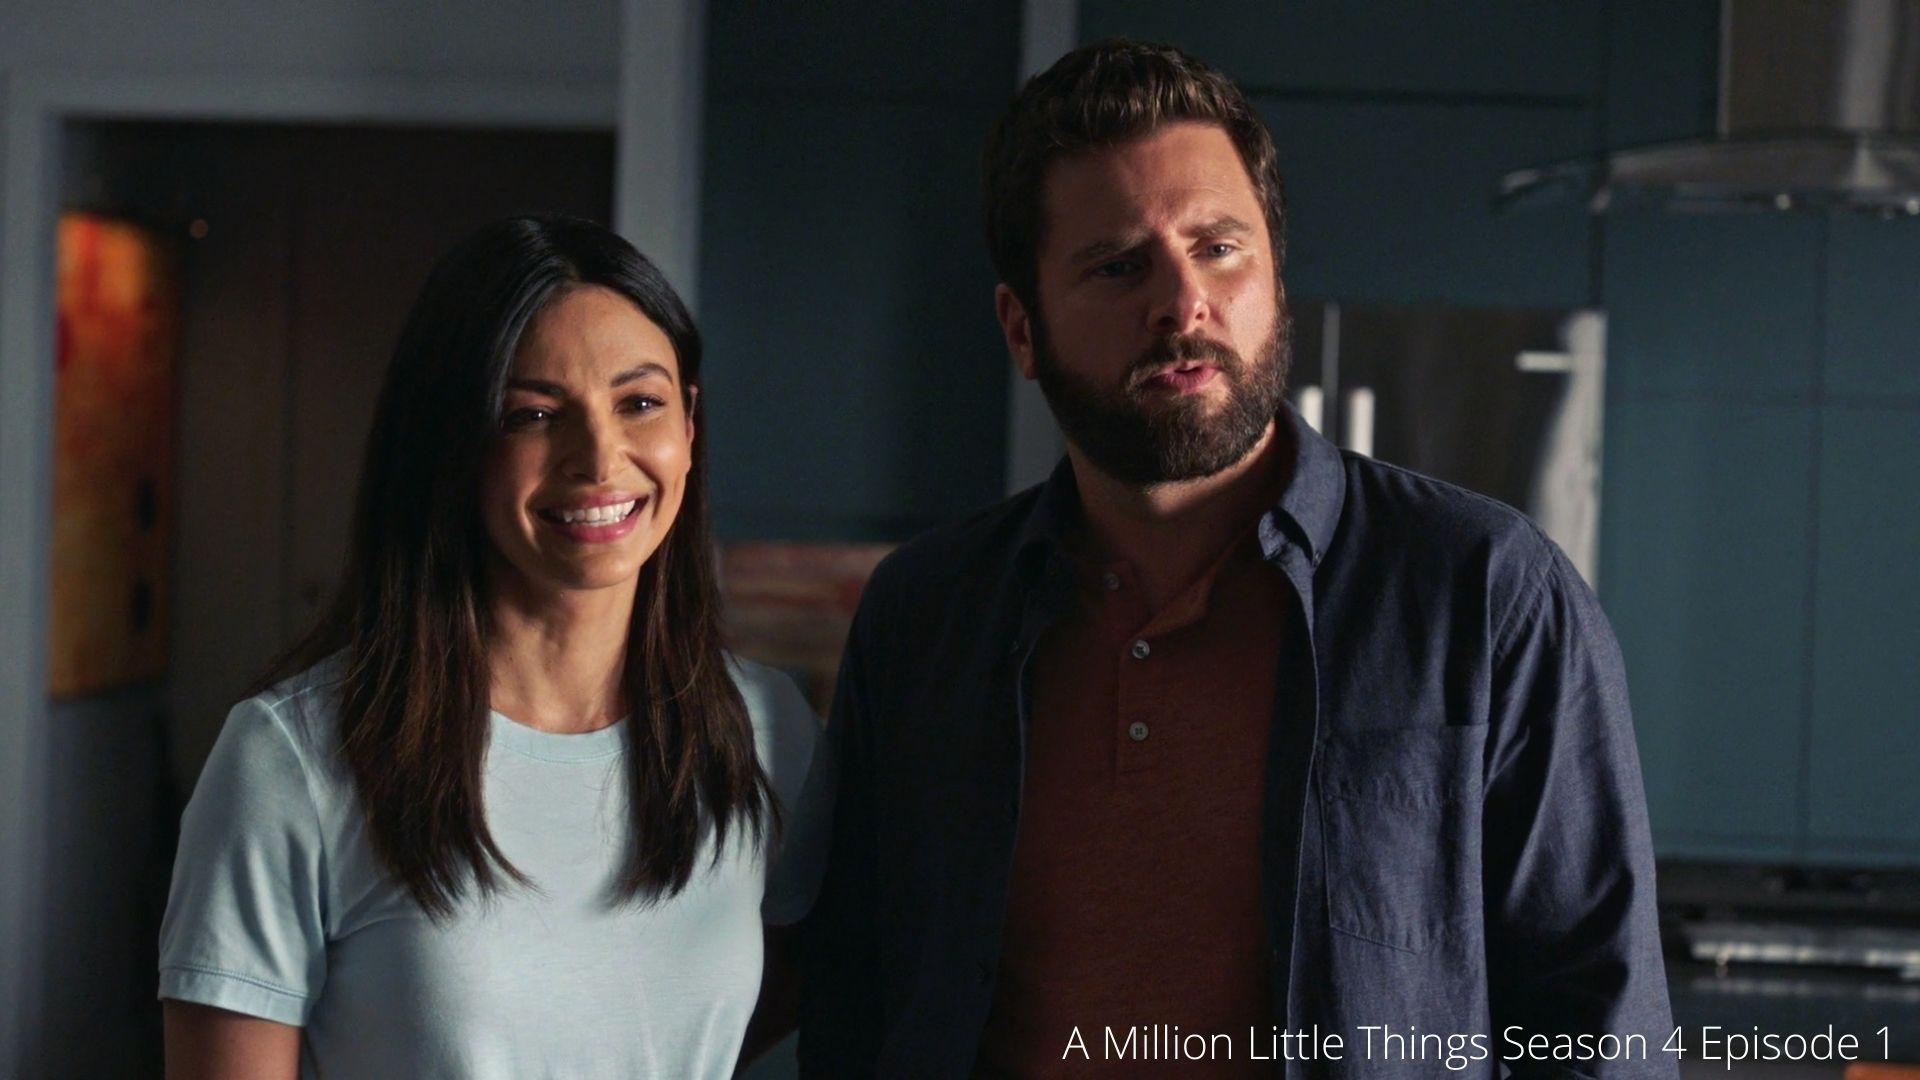 A Million Little Things Season 4 Episode 2